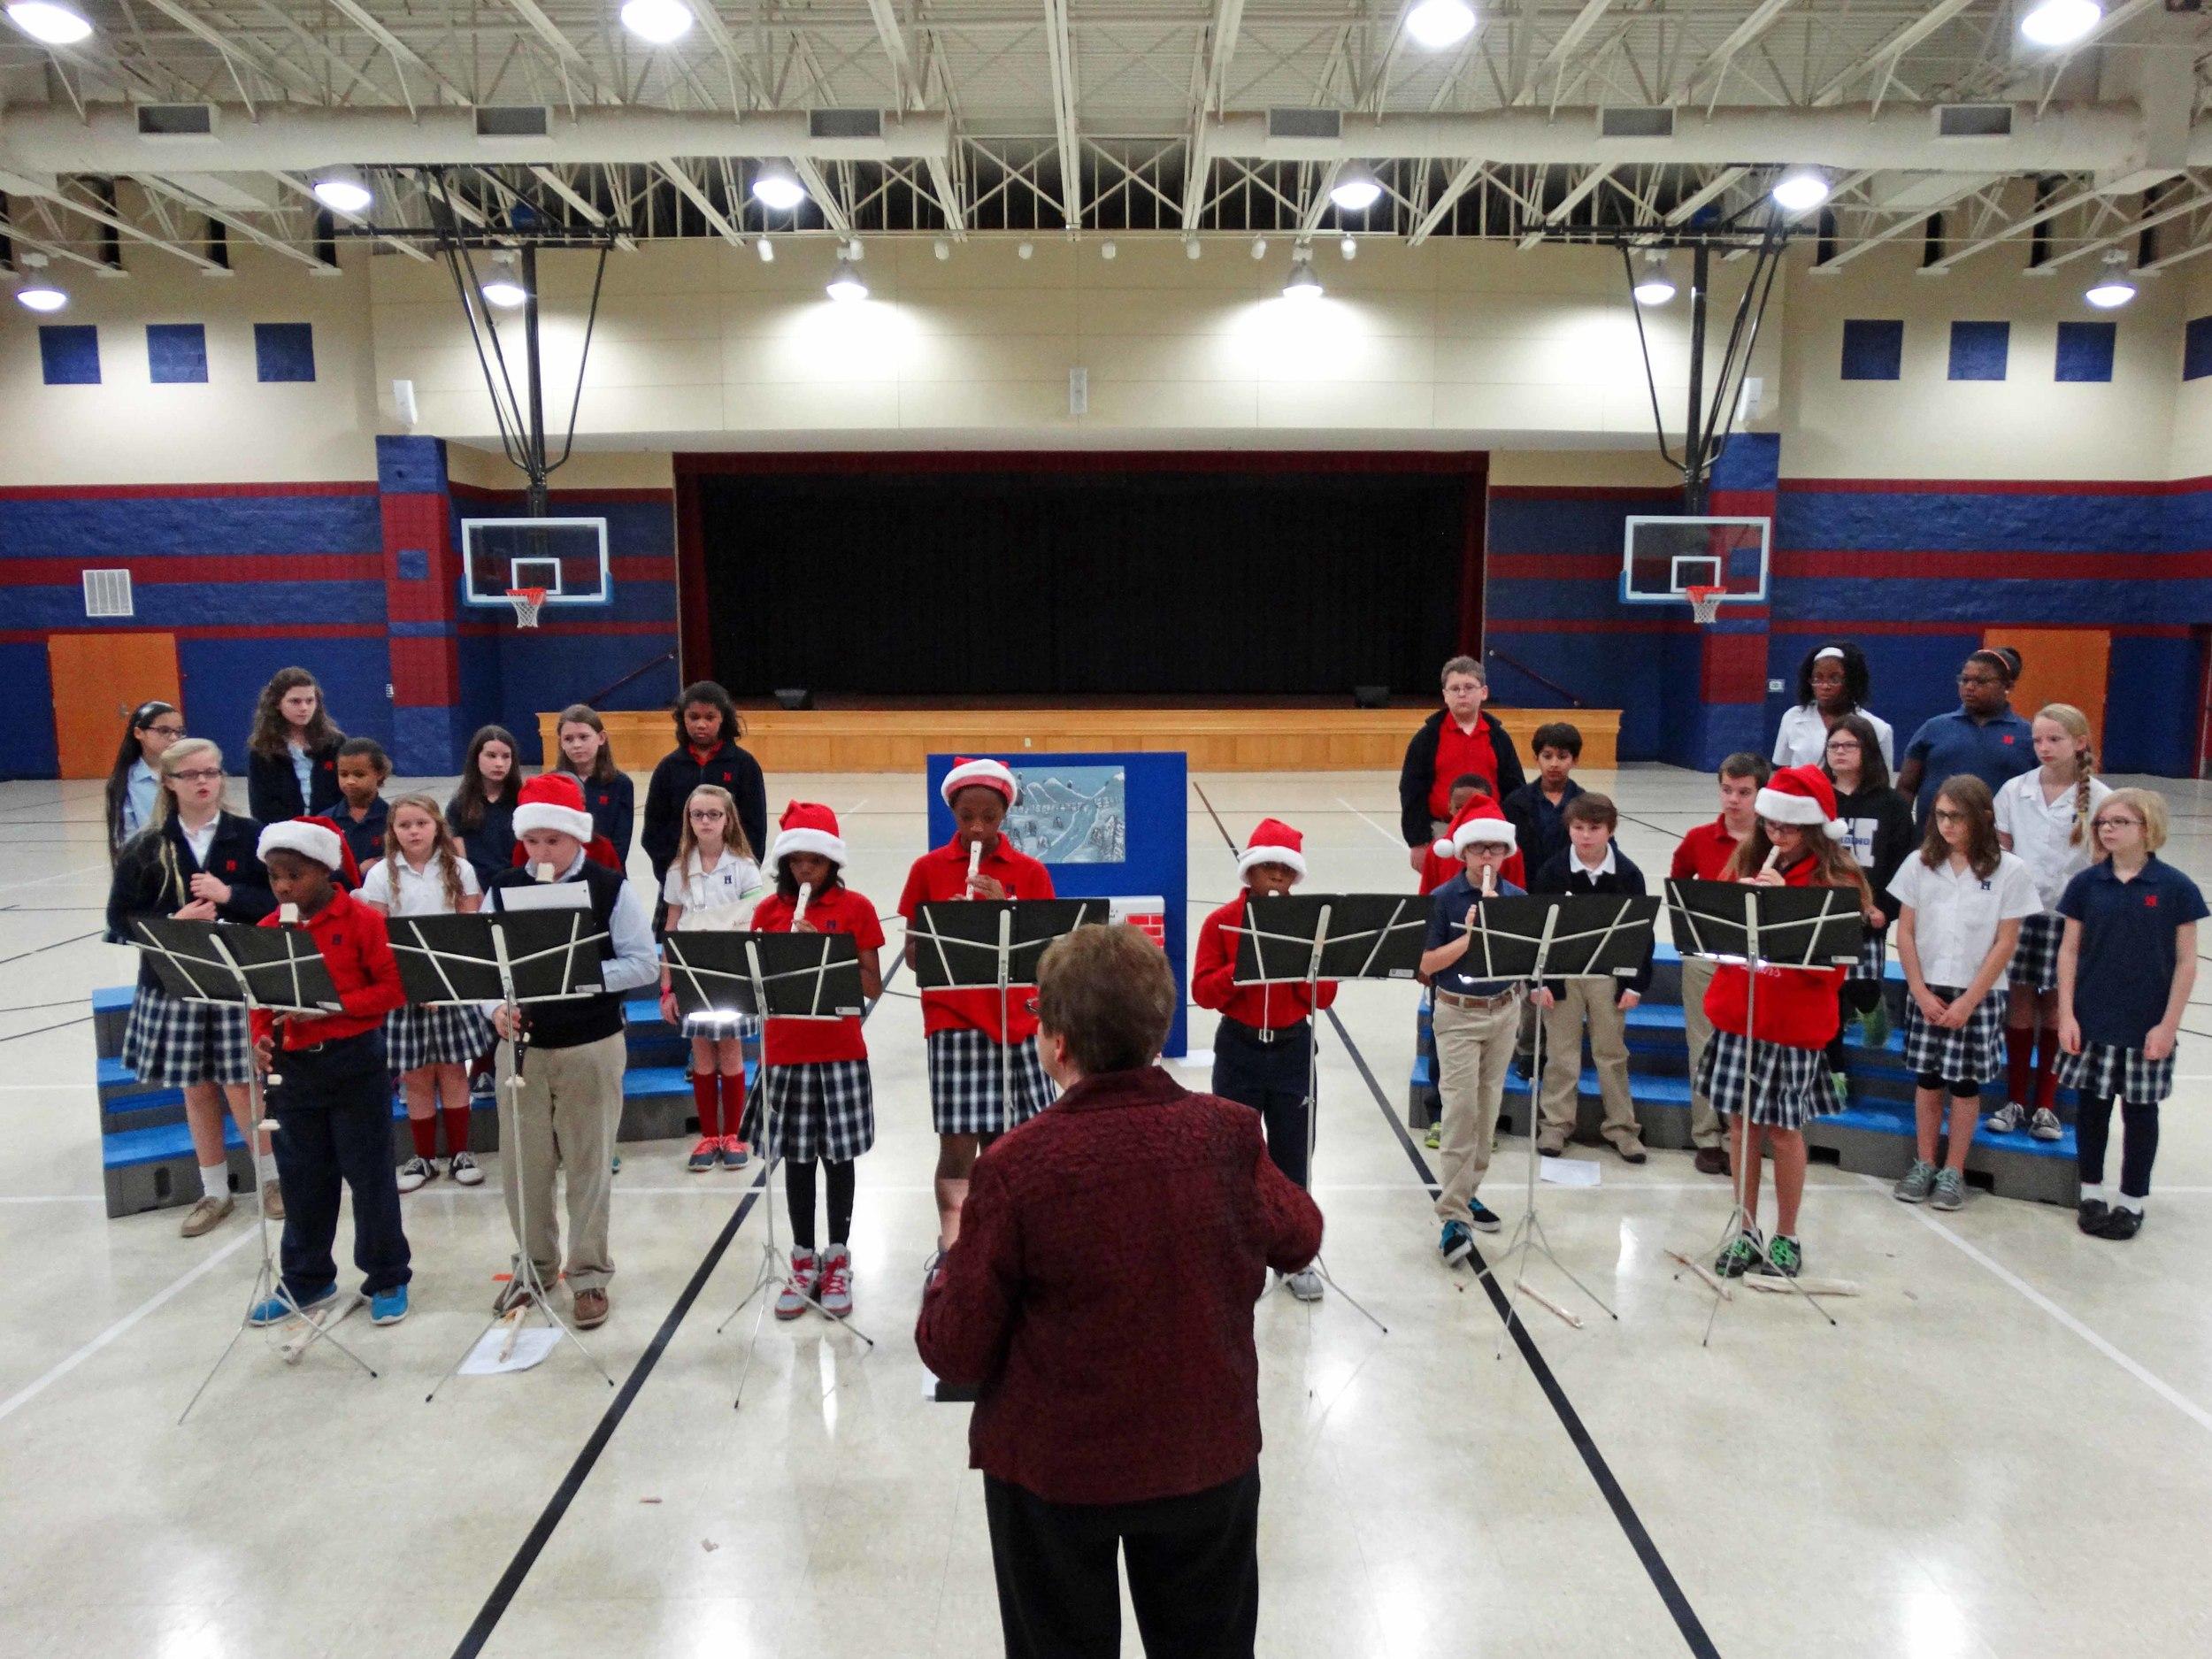 Dec17 CDLSrecorderEnsemble&Choir19.jpg